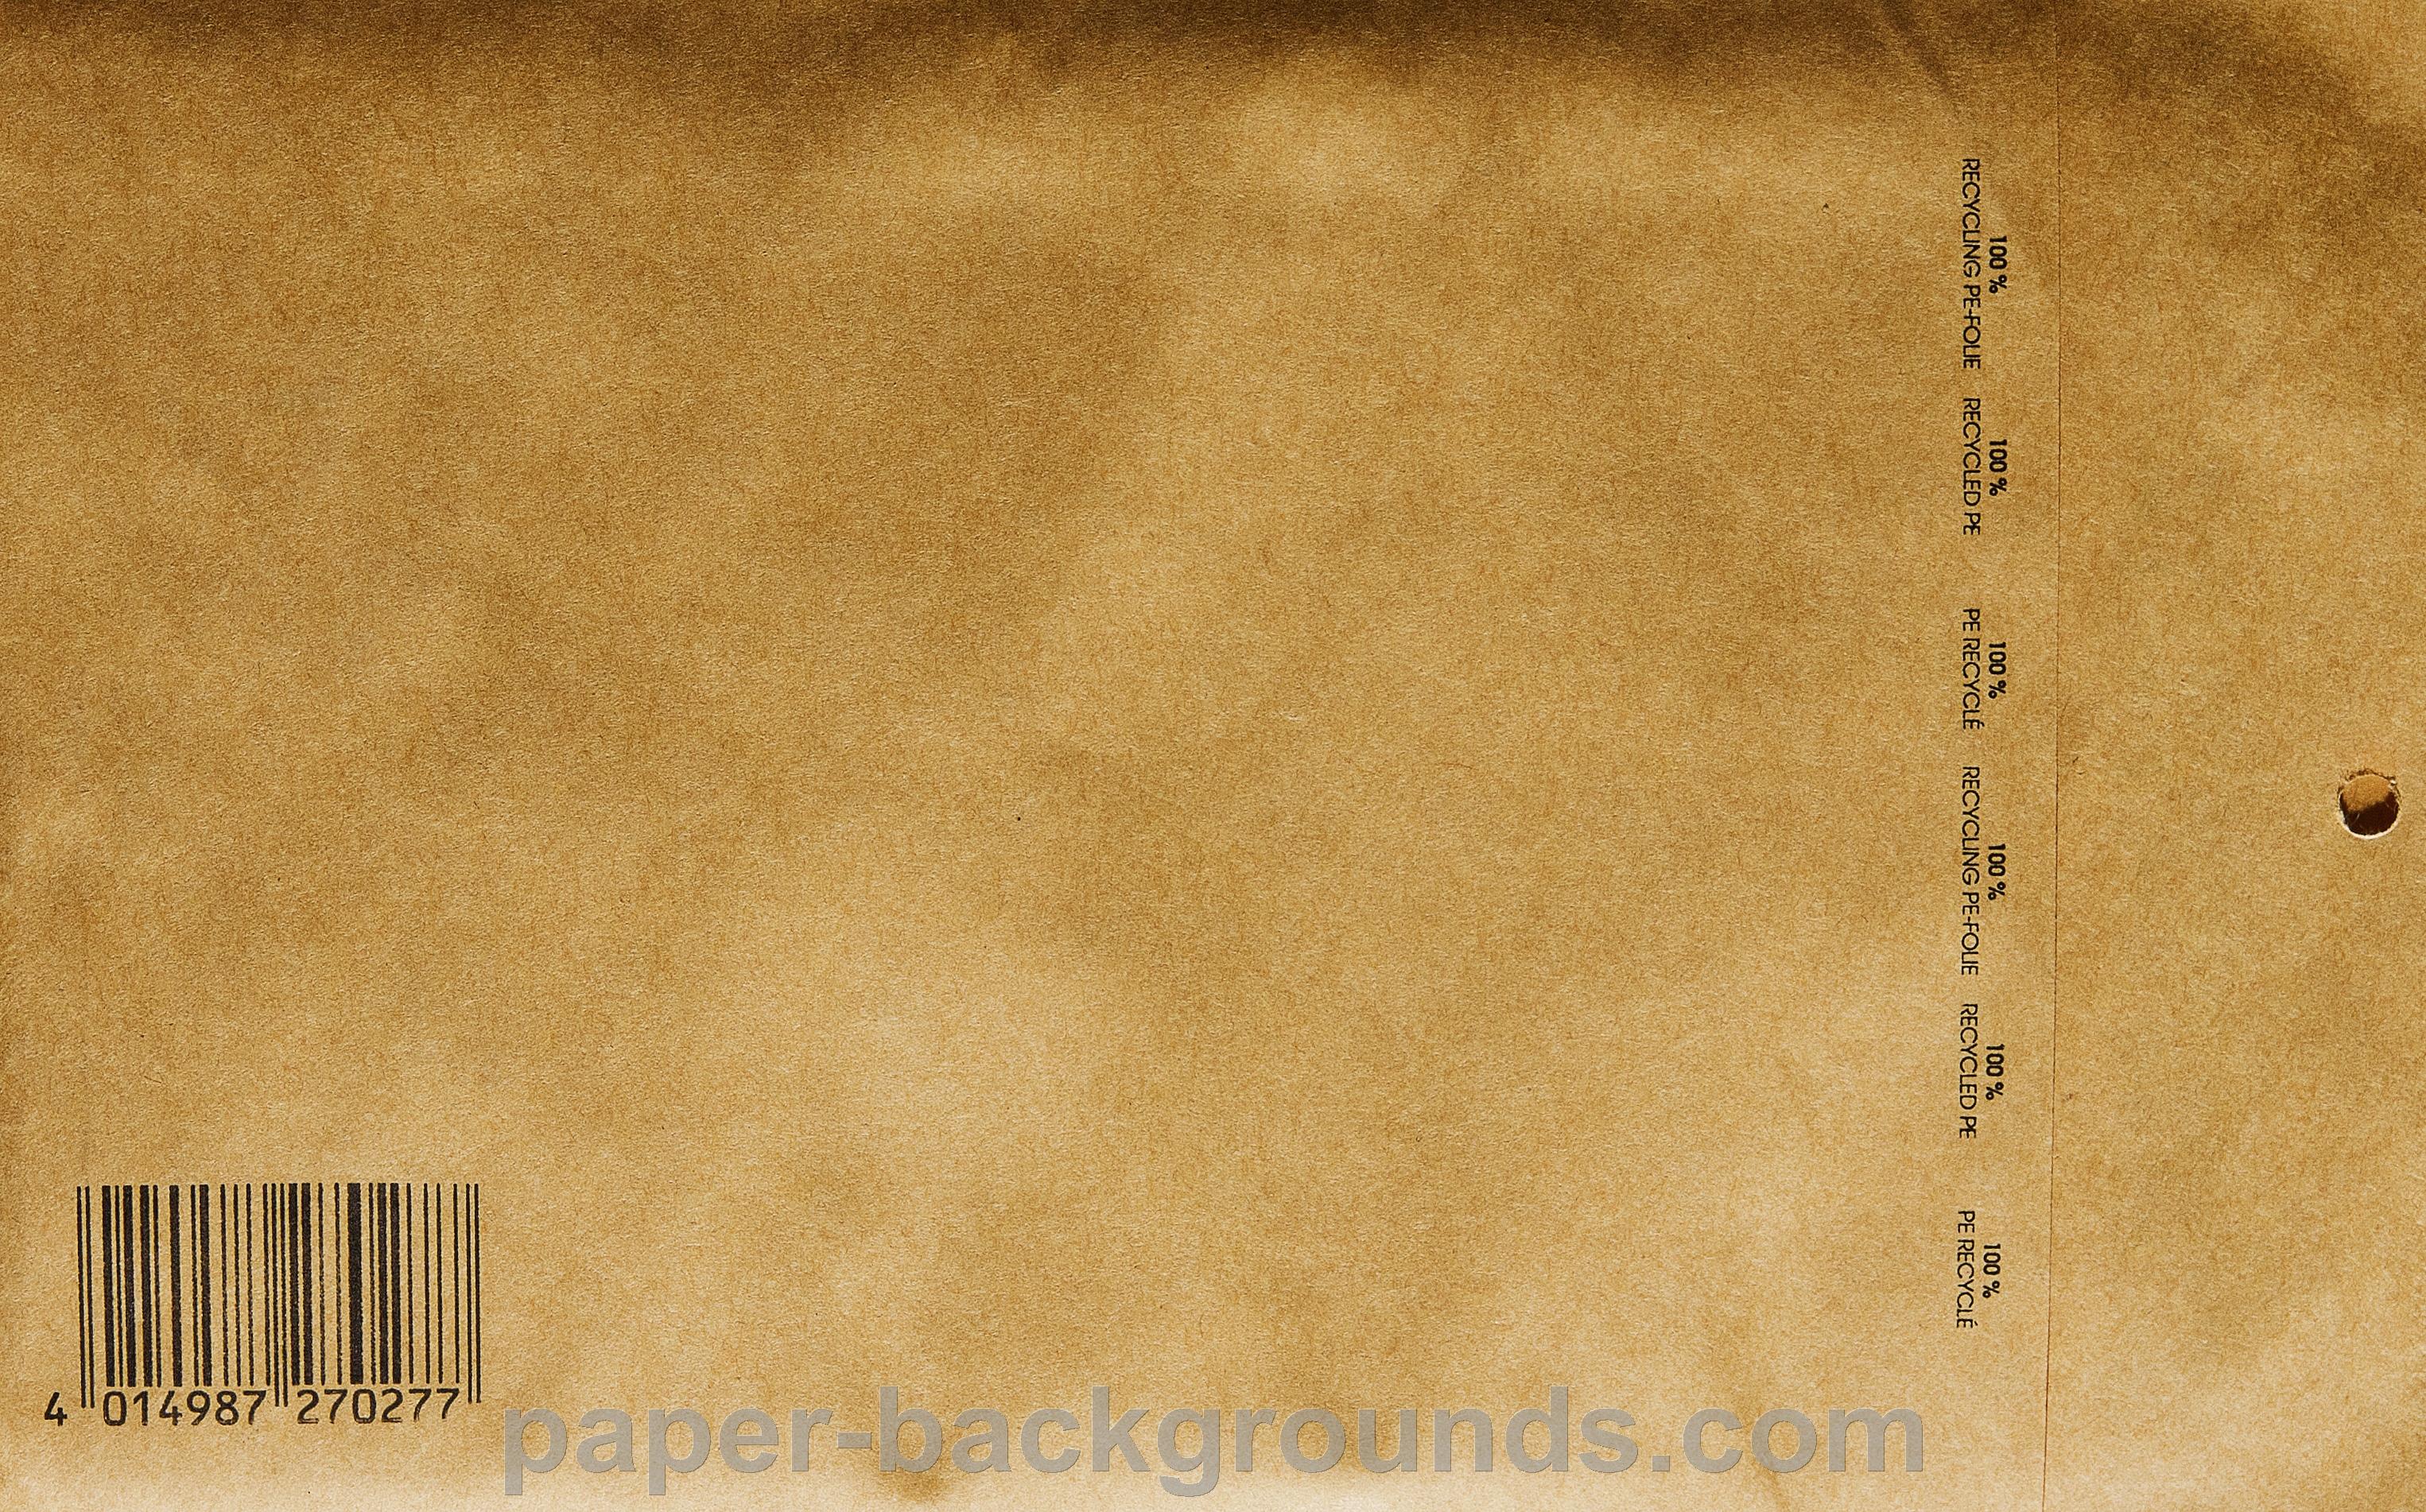 envelope bag paper brown Paper Backgrounds 3051x1902